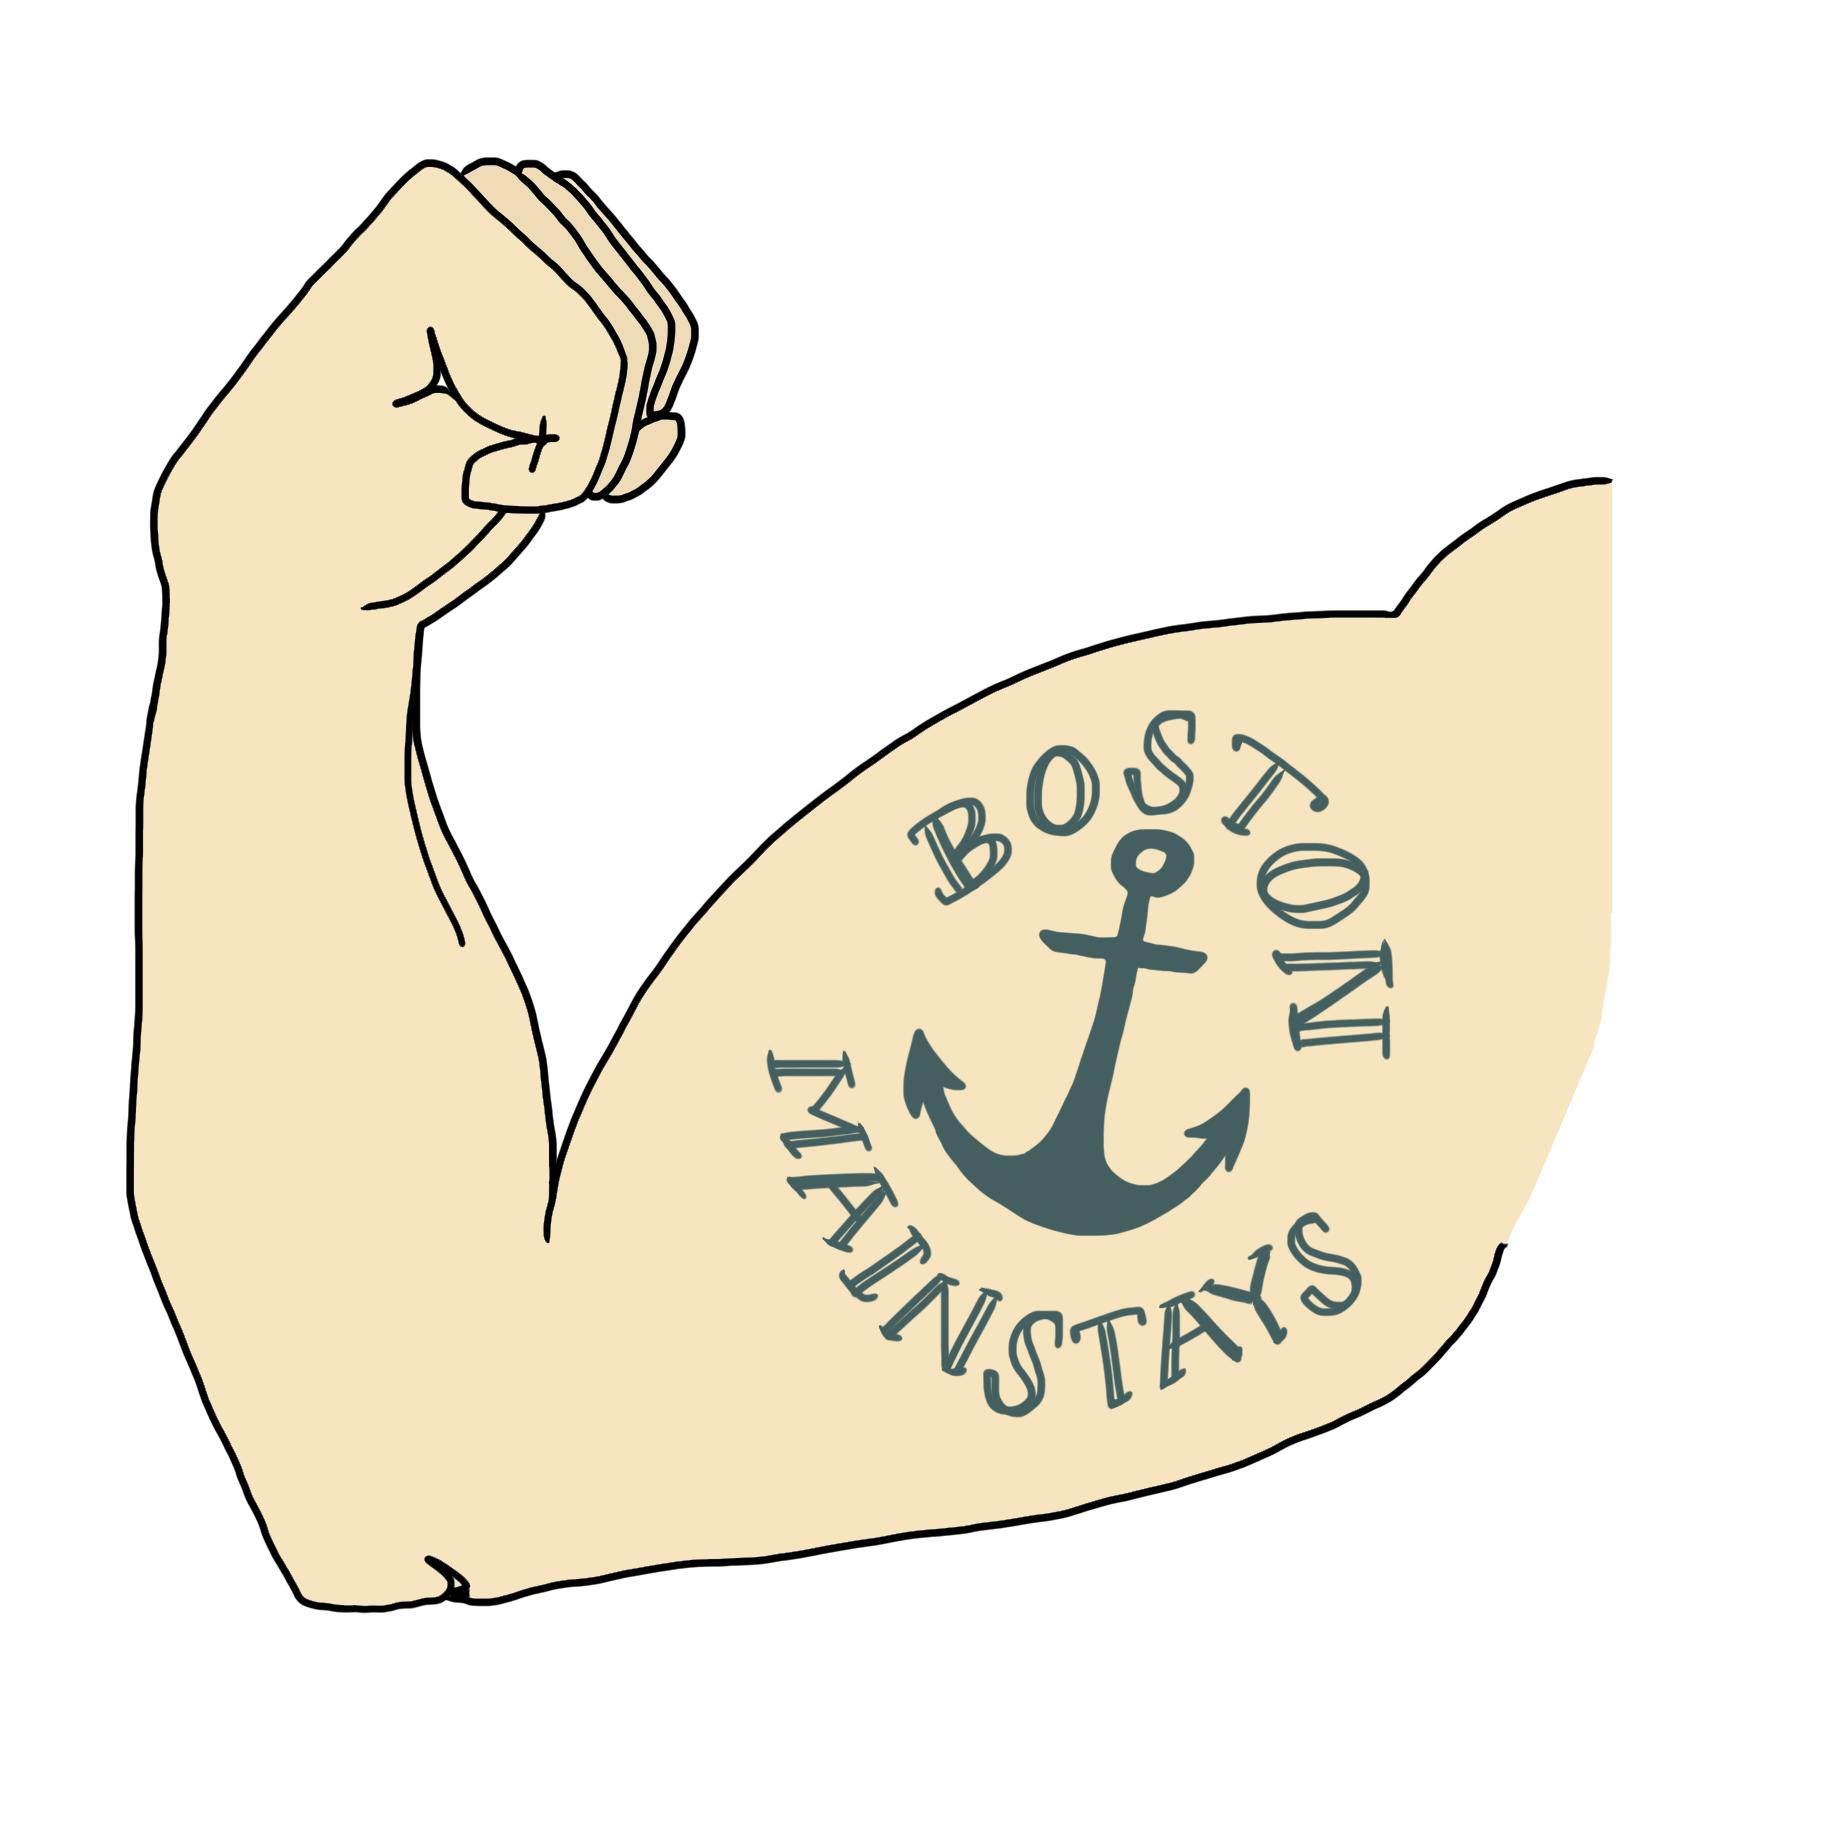 Boston Mainstays logo square